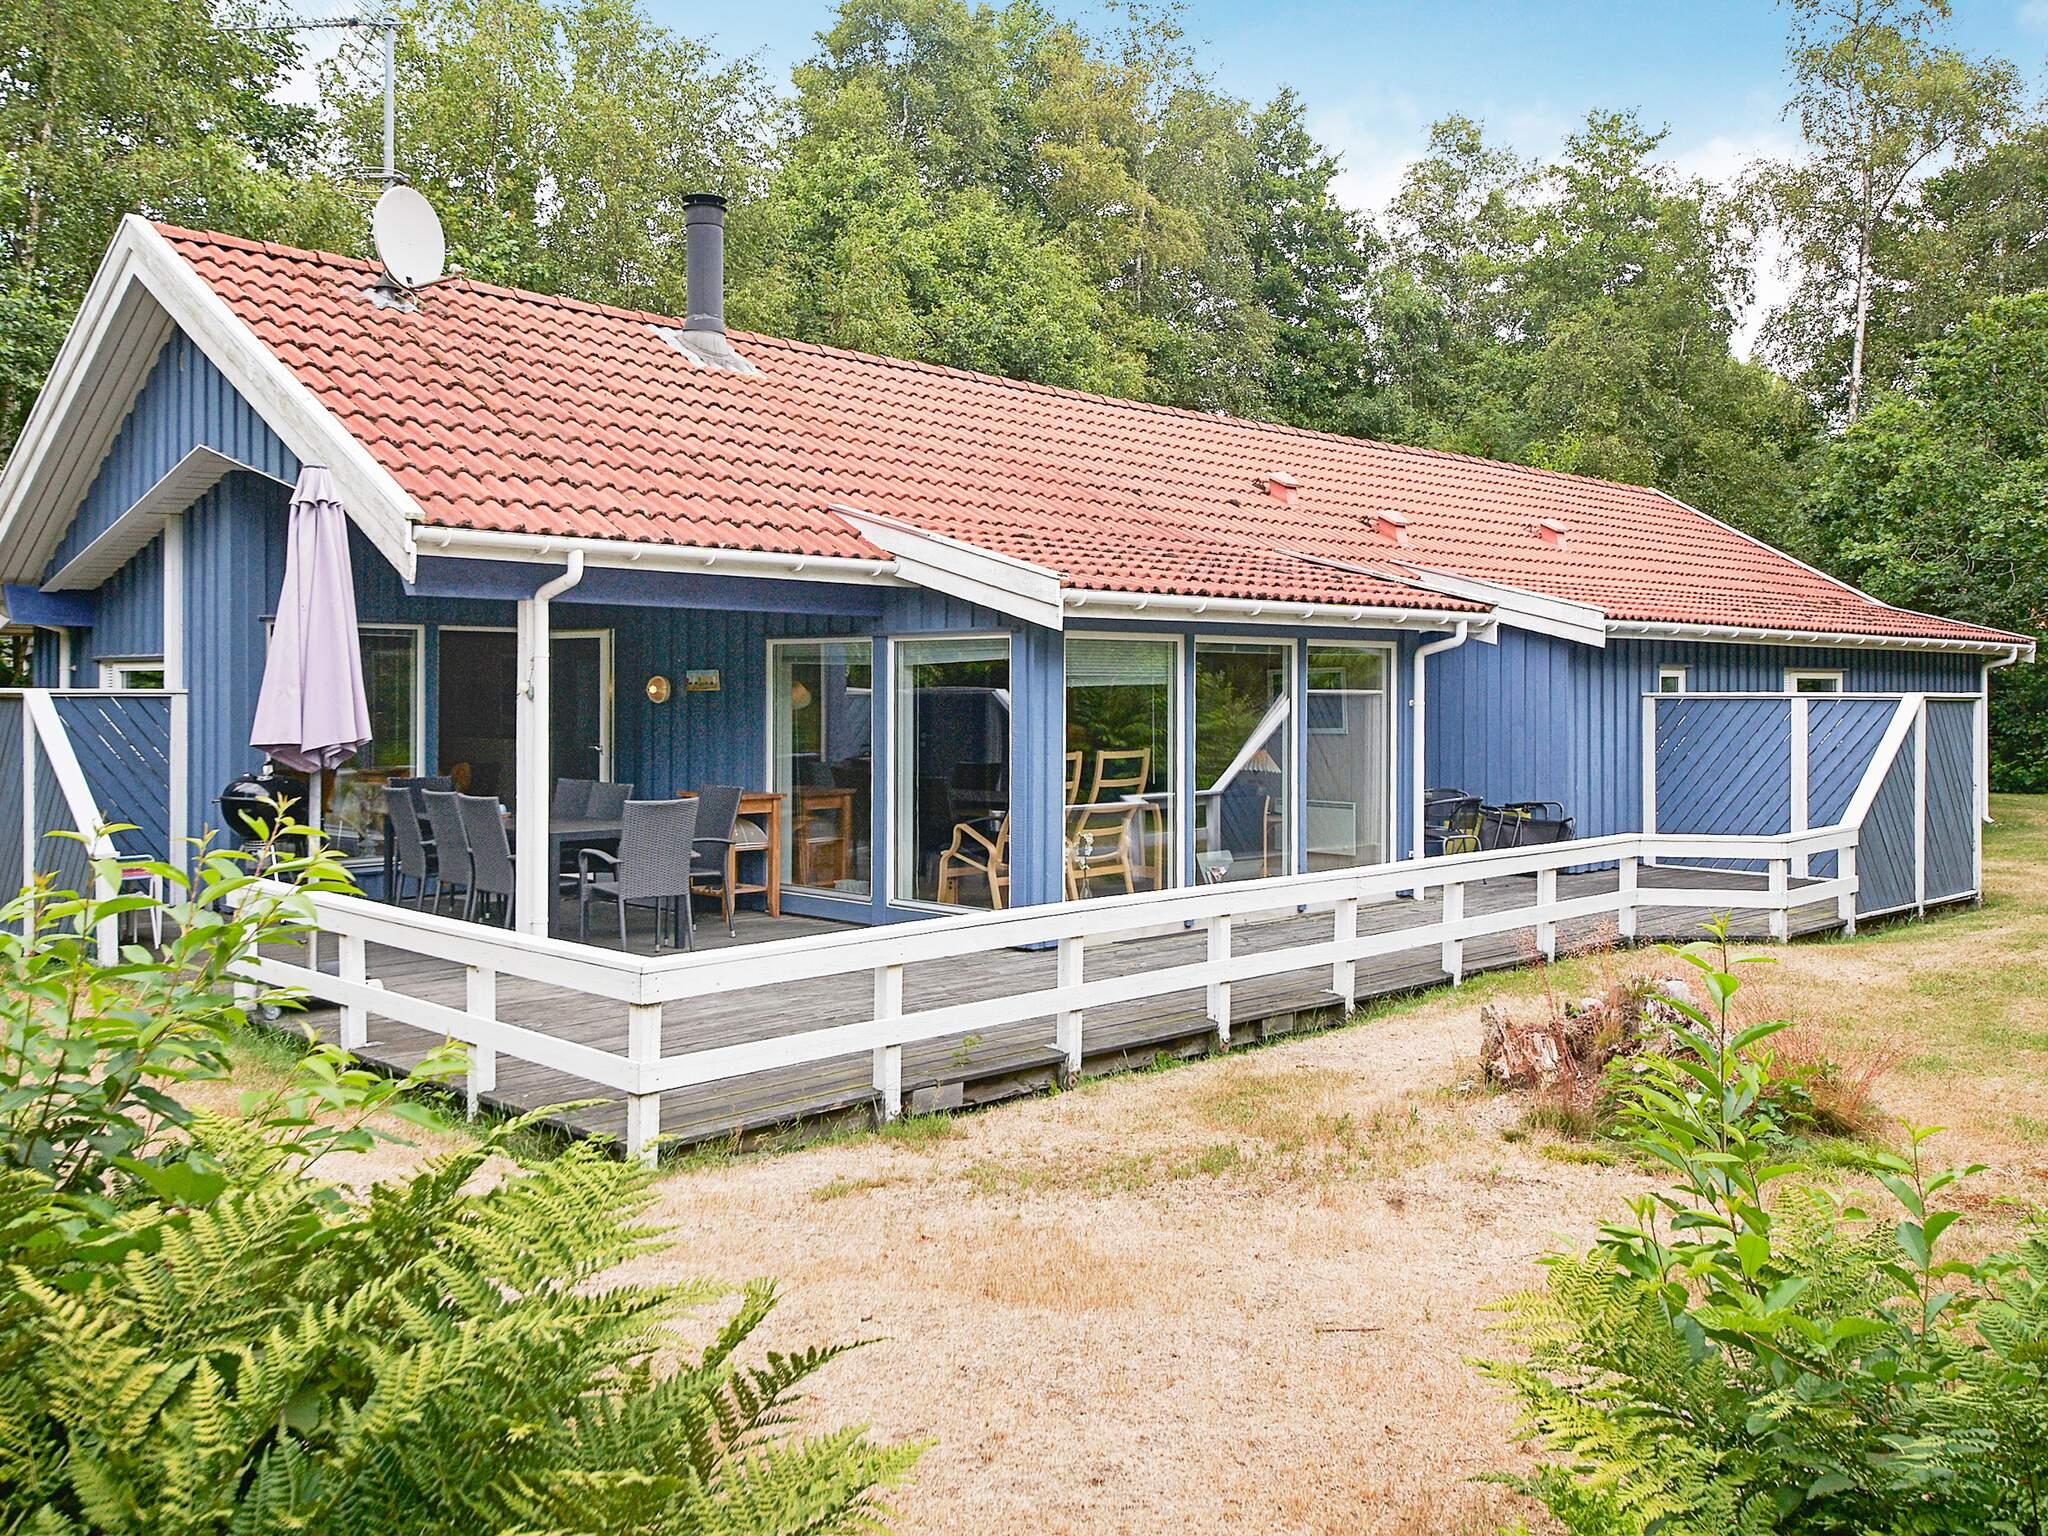 Maison de vacances Østre Sømarken (82551), Aakirkeby, , Bornholm, Danemark, image 1